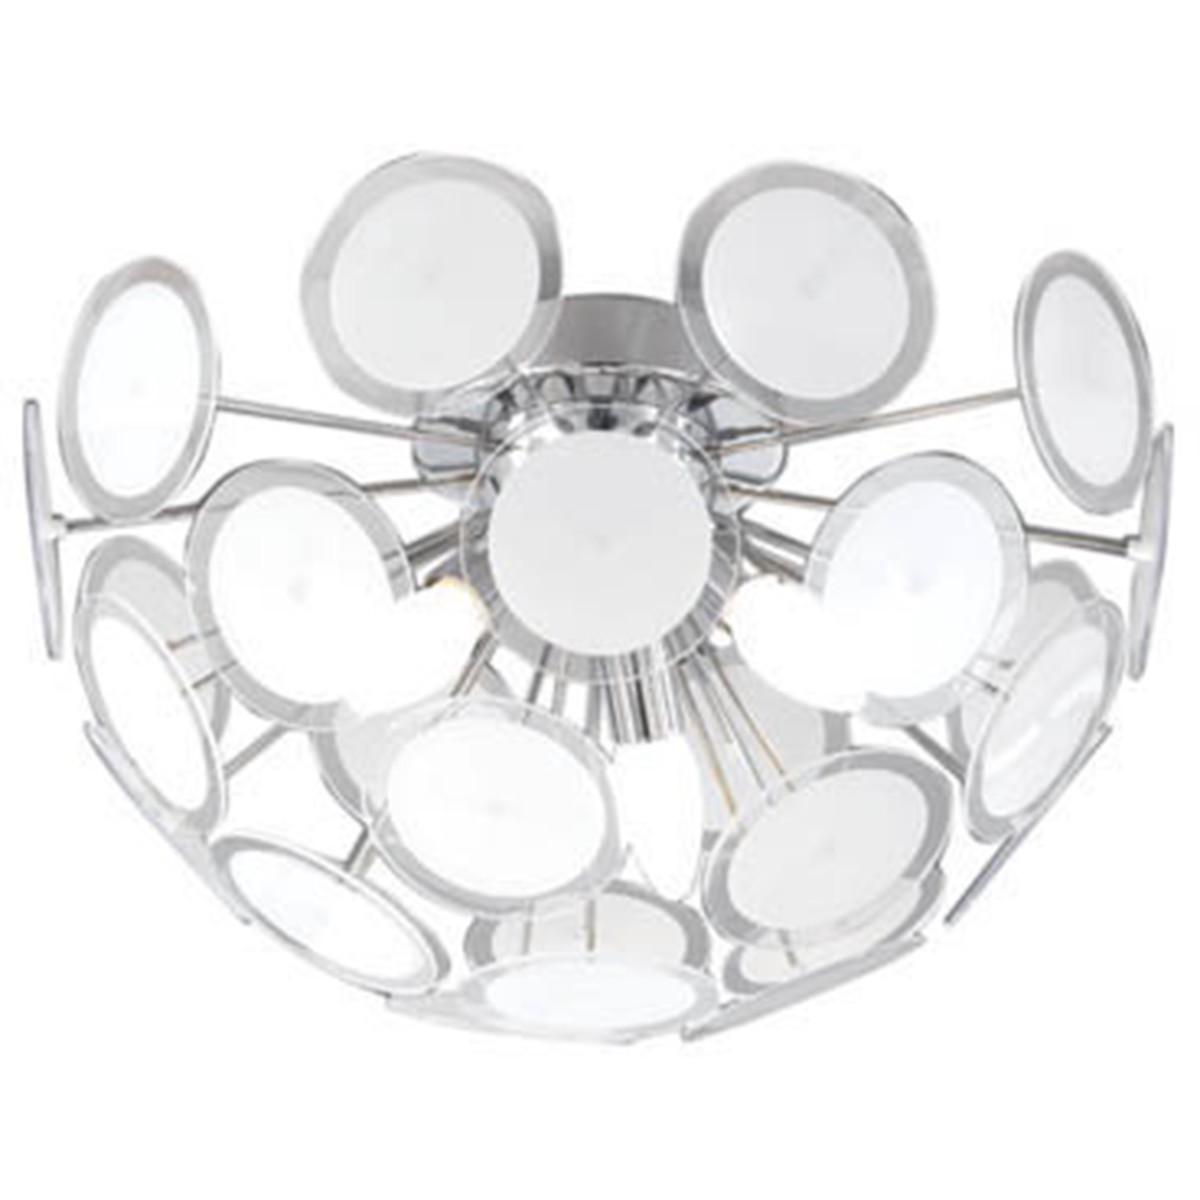 LED Plafondlamp - Plafondverlichting - Trion Dolci - E14 Fitting - Rond - Mat Chroom - Aluminium